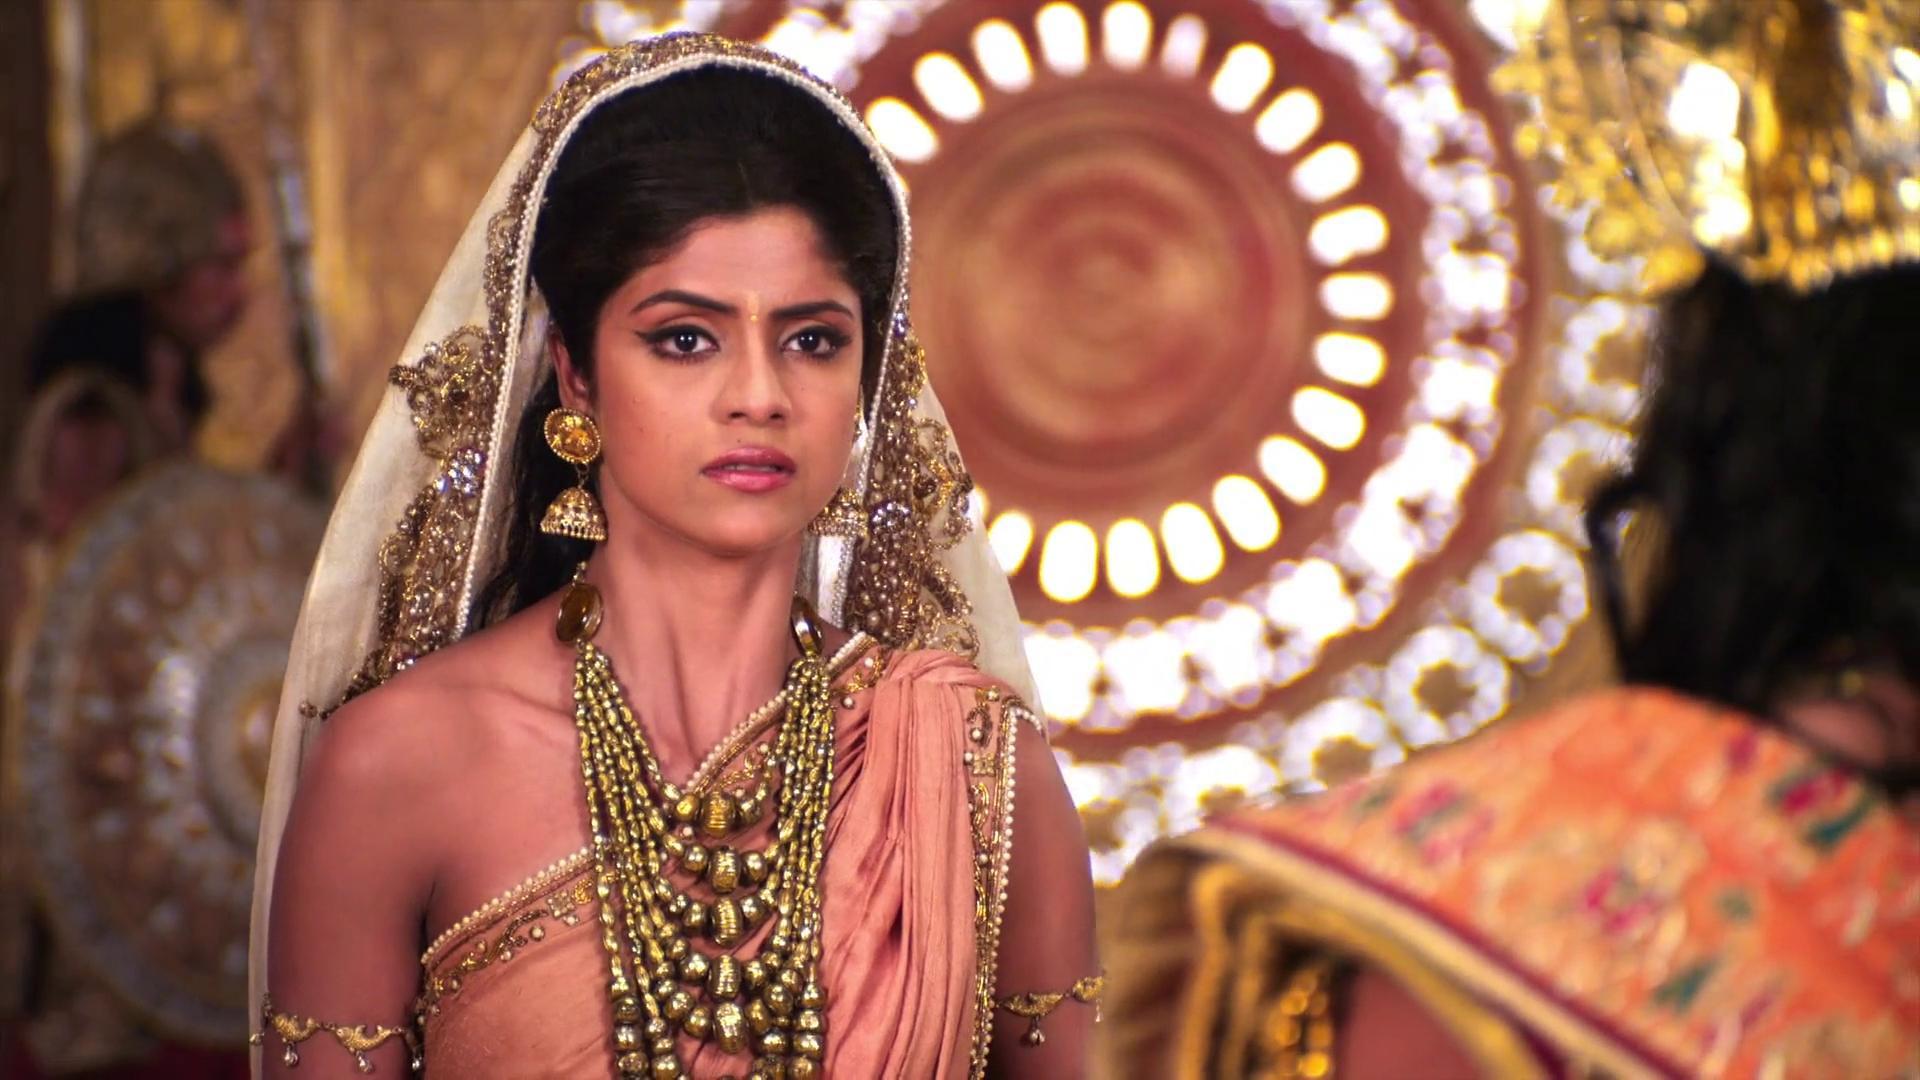 mahabaratham Star vijay tv mahabharatham download all episodes up-to end in tamil in tiruvannamalai new music - movies on tiruvannamalai quikr classifieds.